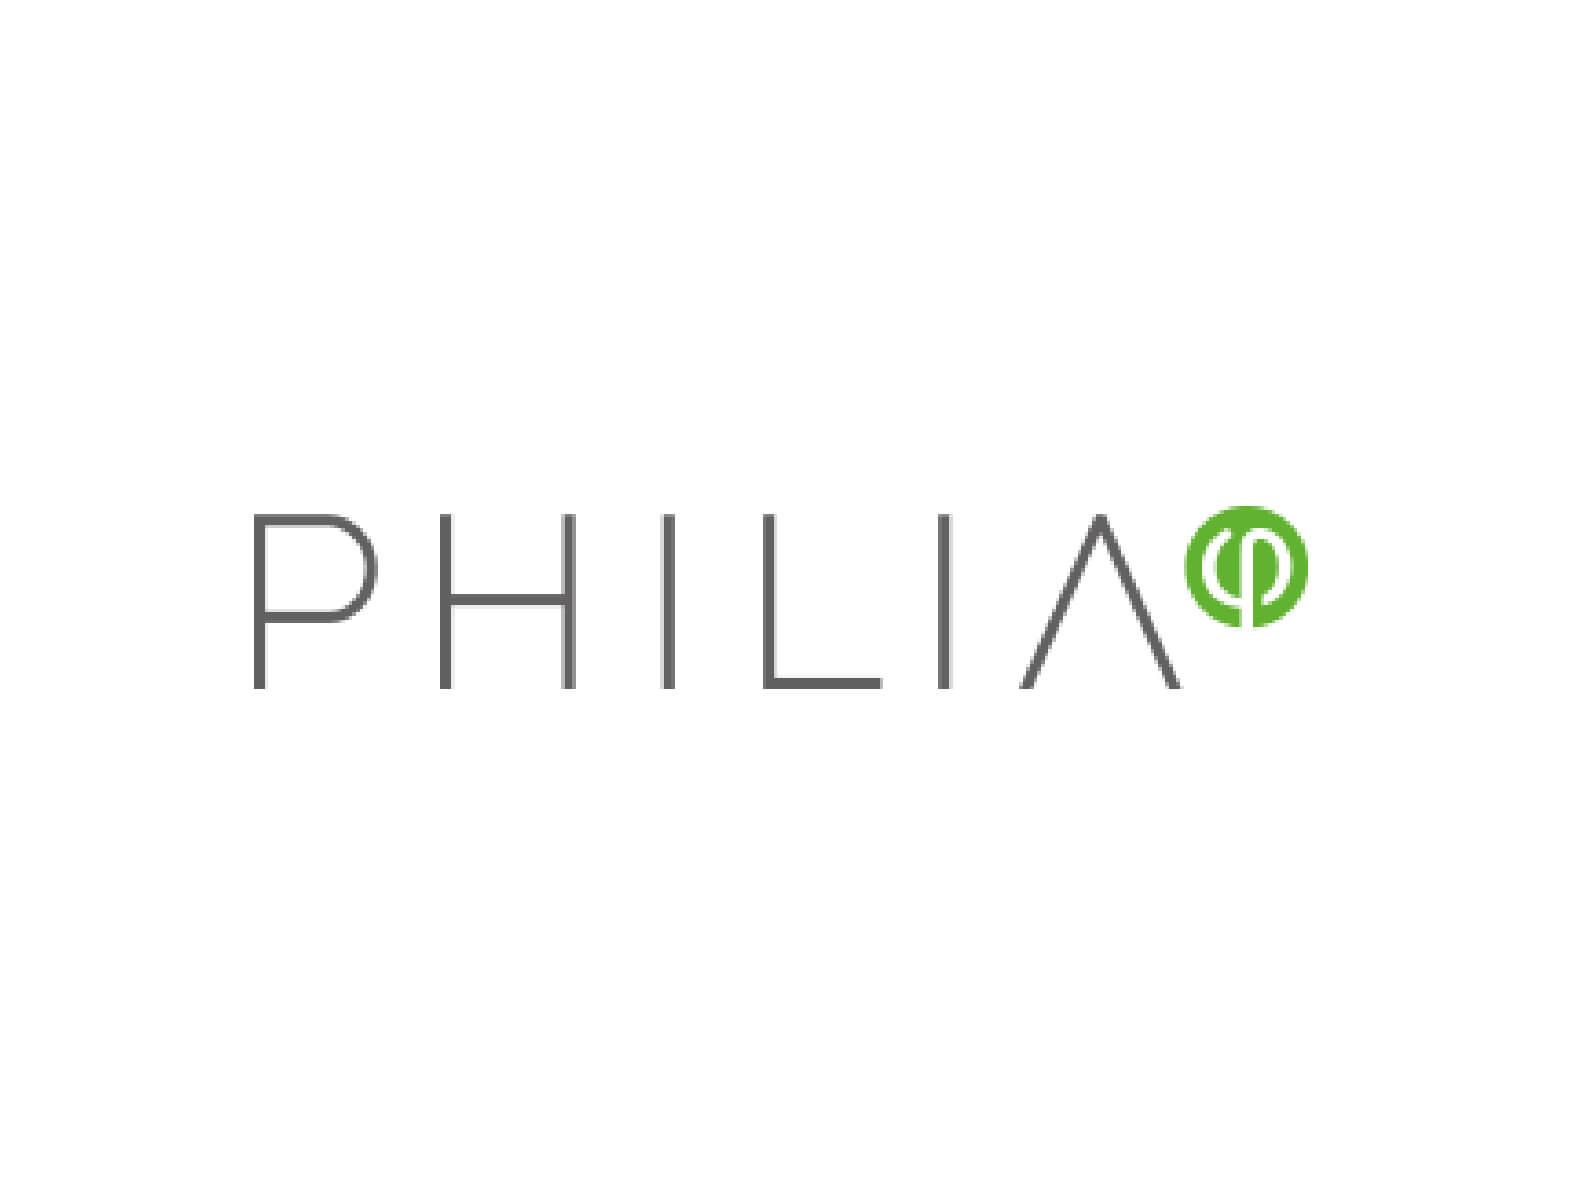 agence kayak communication web lille nord logo philia